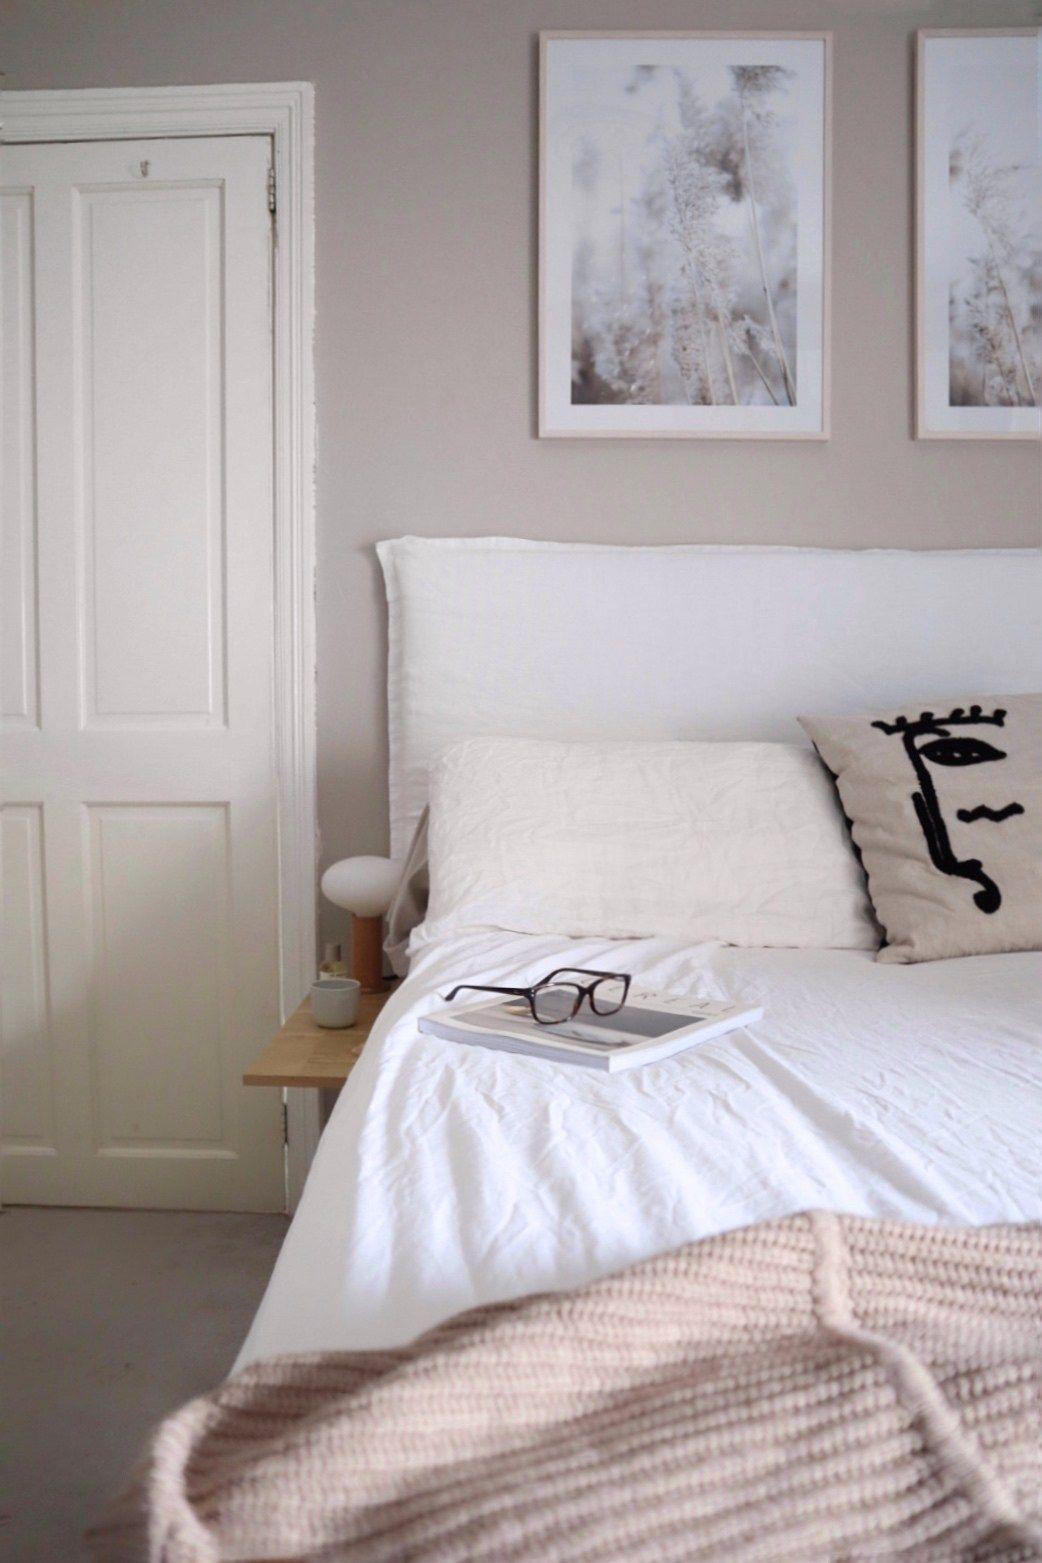 DIY Linen Headboard for Your Bedroom Create a Bespoke